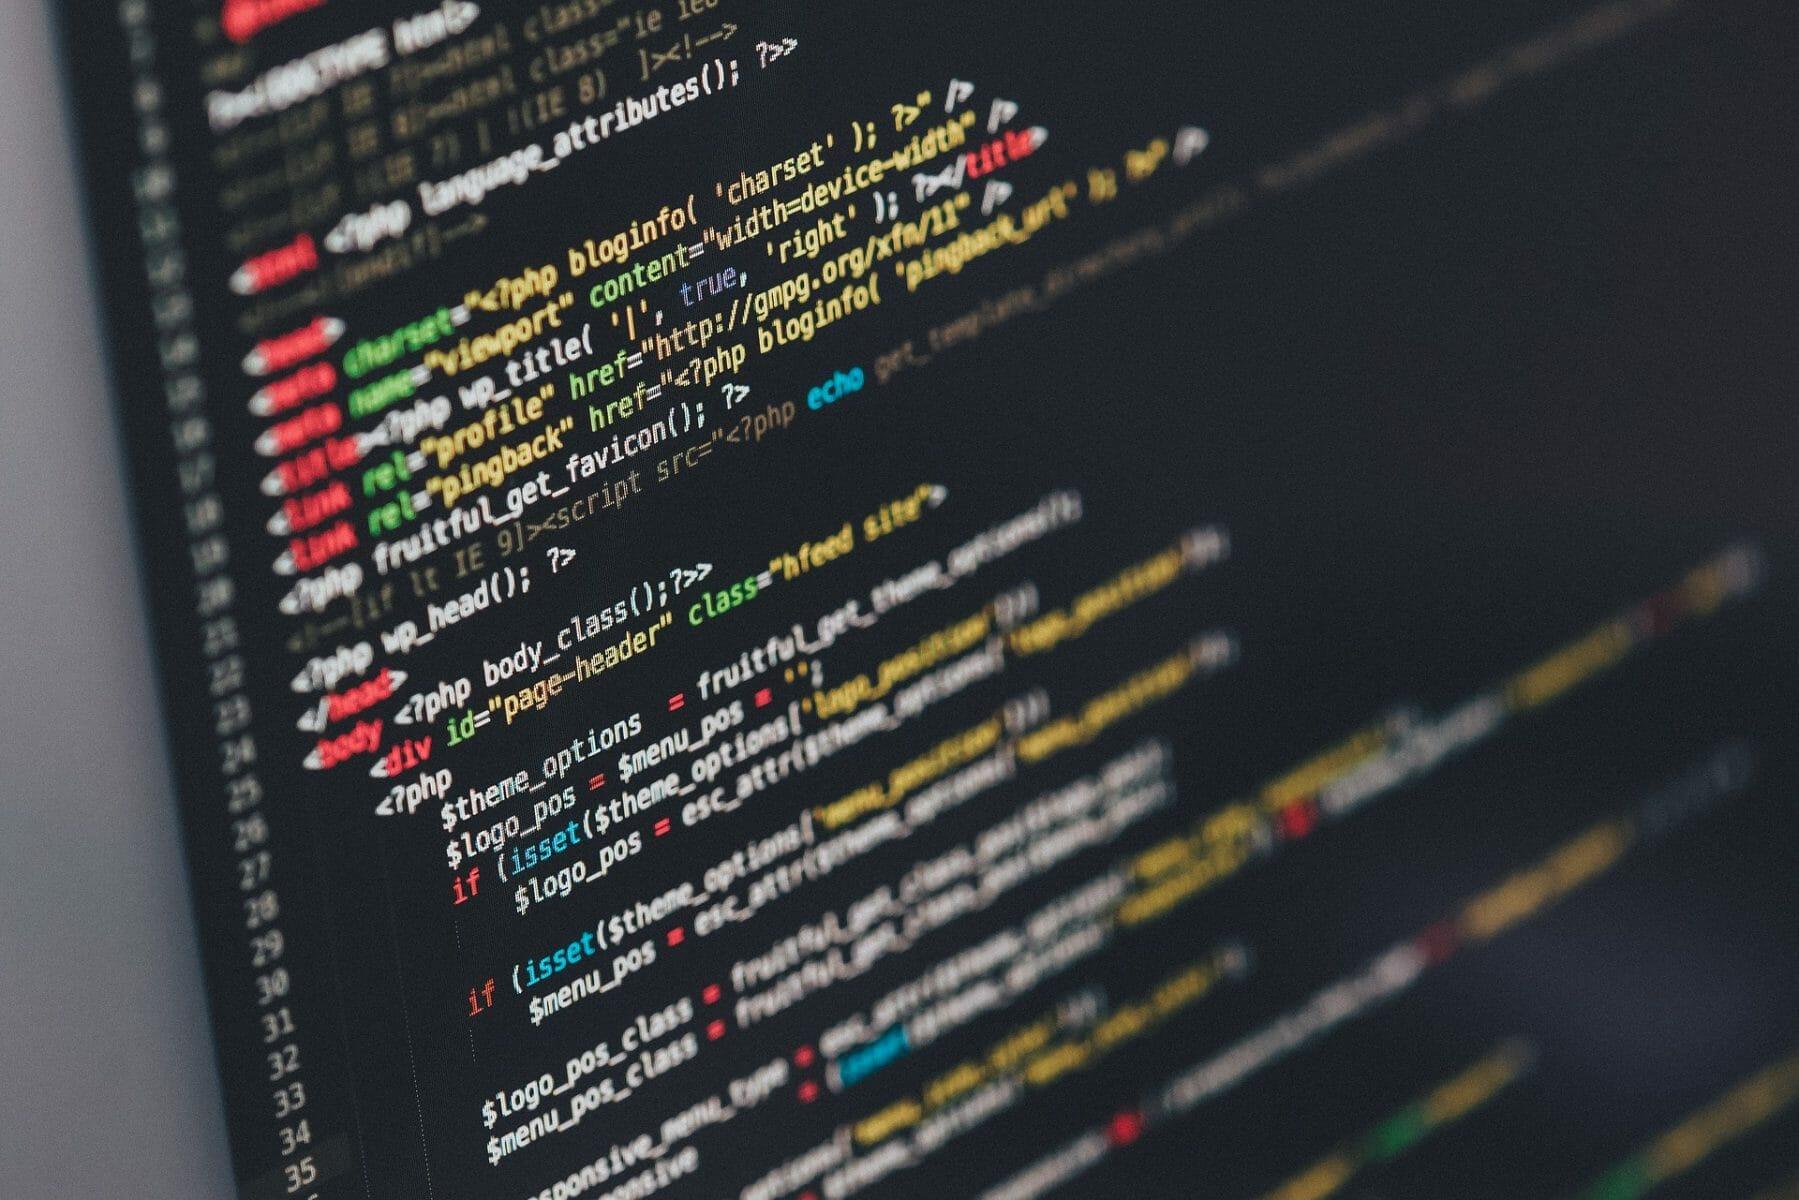 Codeacademy Report Provides A Glimpse into the Demographics